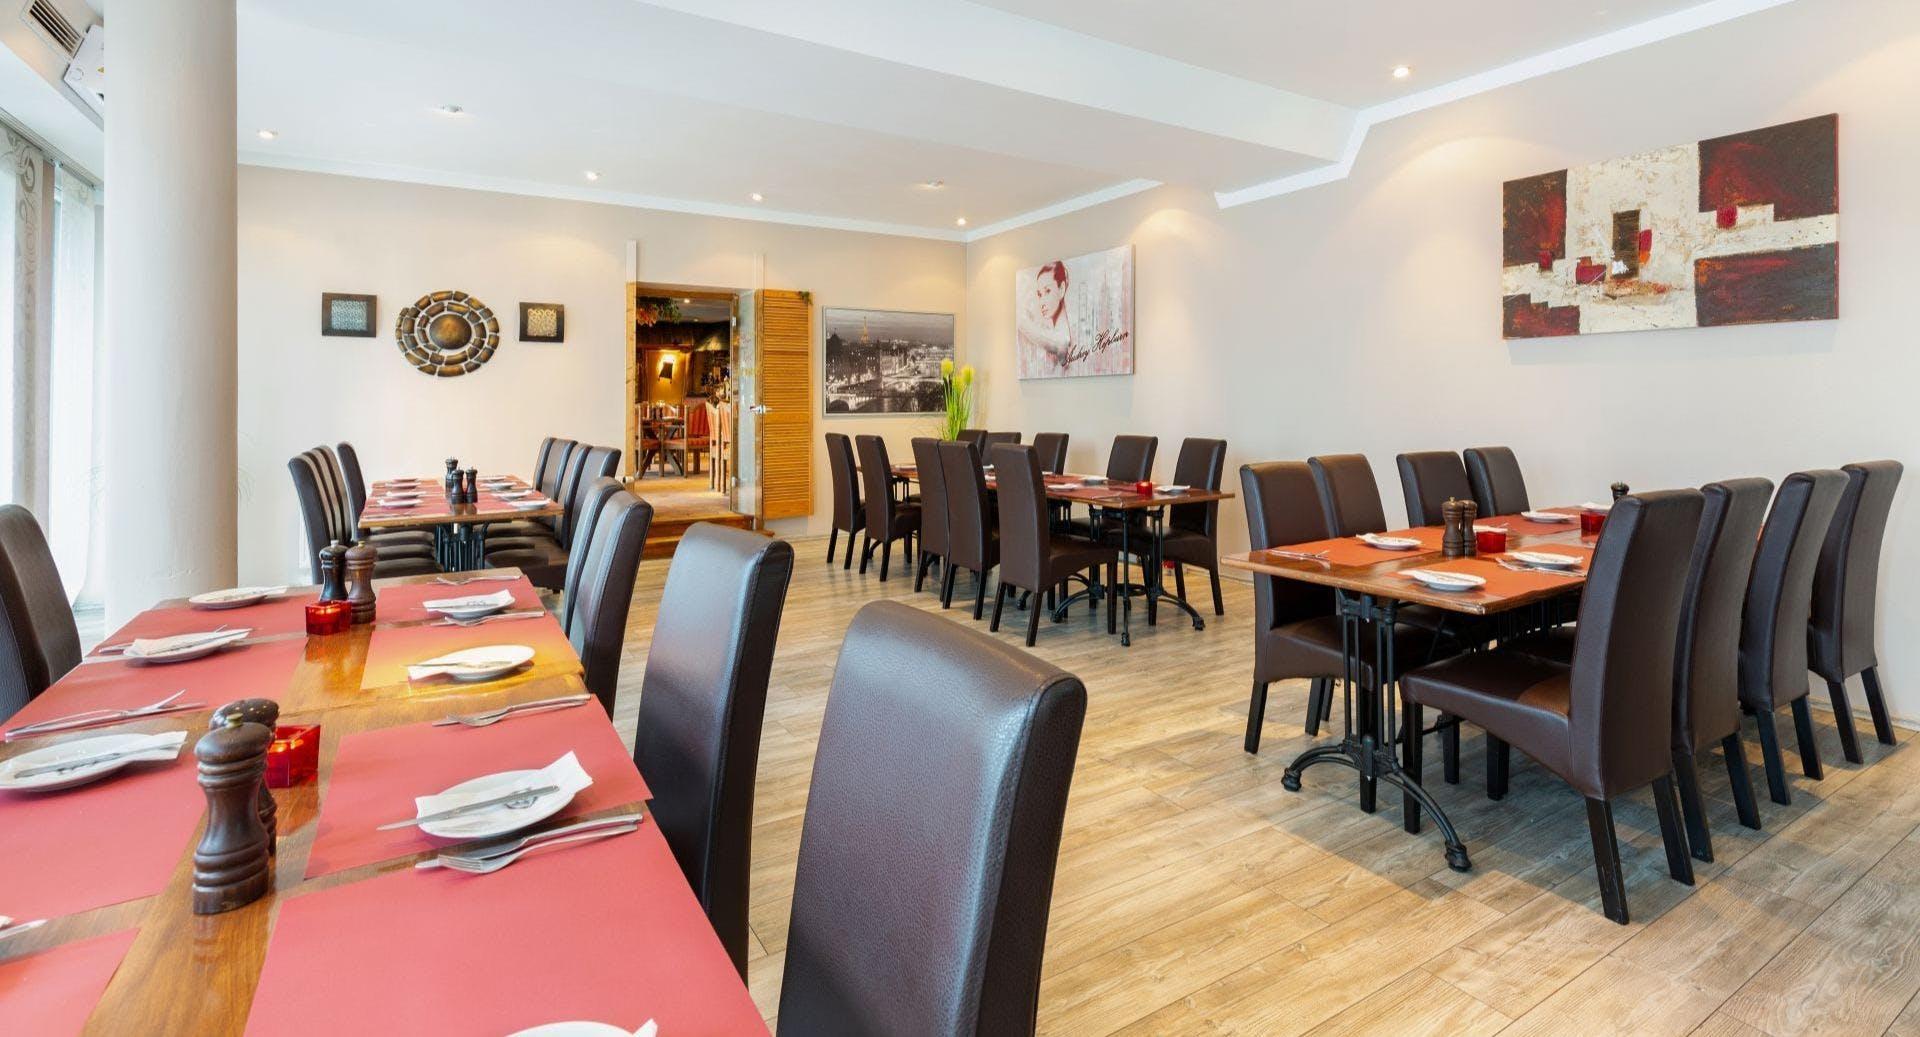 Nour's Angus Restaurant - Steakhaus Leverkusen image 2